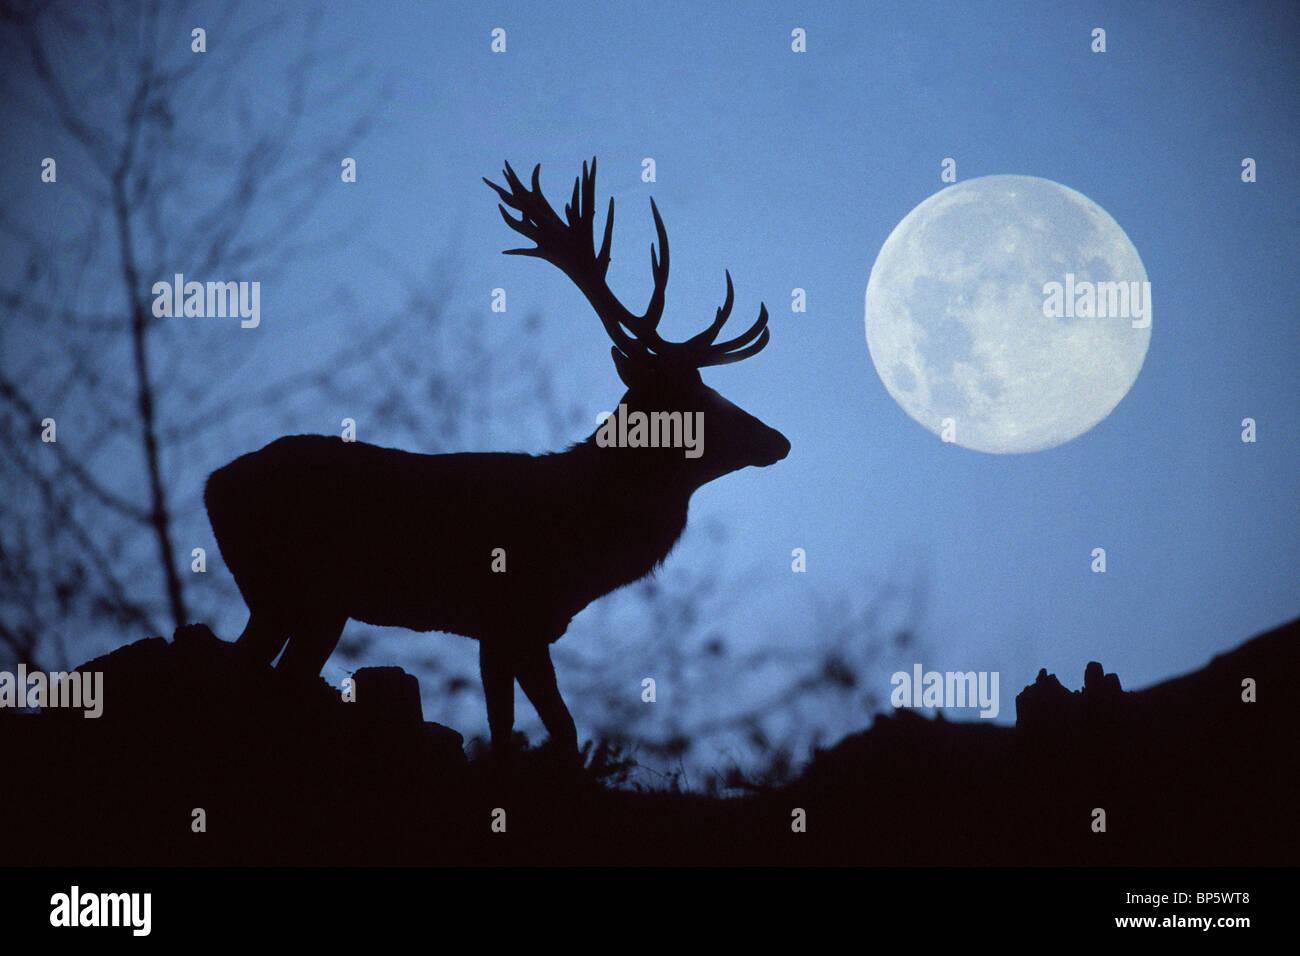 AR80H6 European Red Deer, Rothirsch Cervus elaphus, Europe Stock Photo